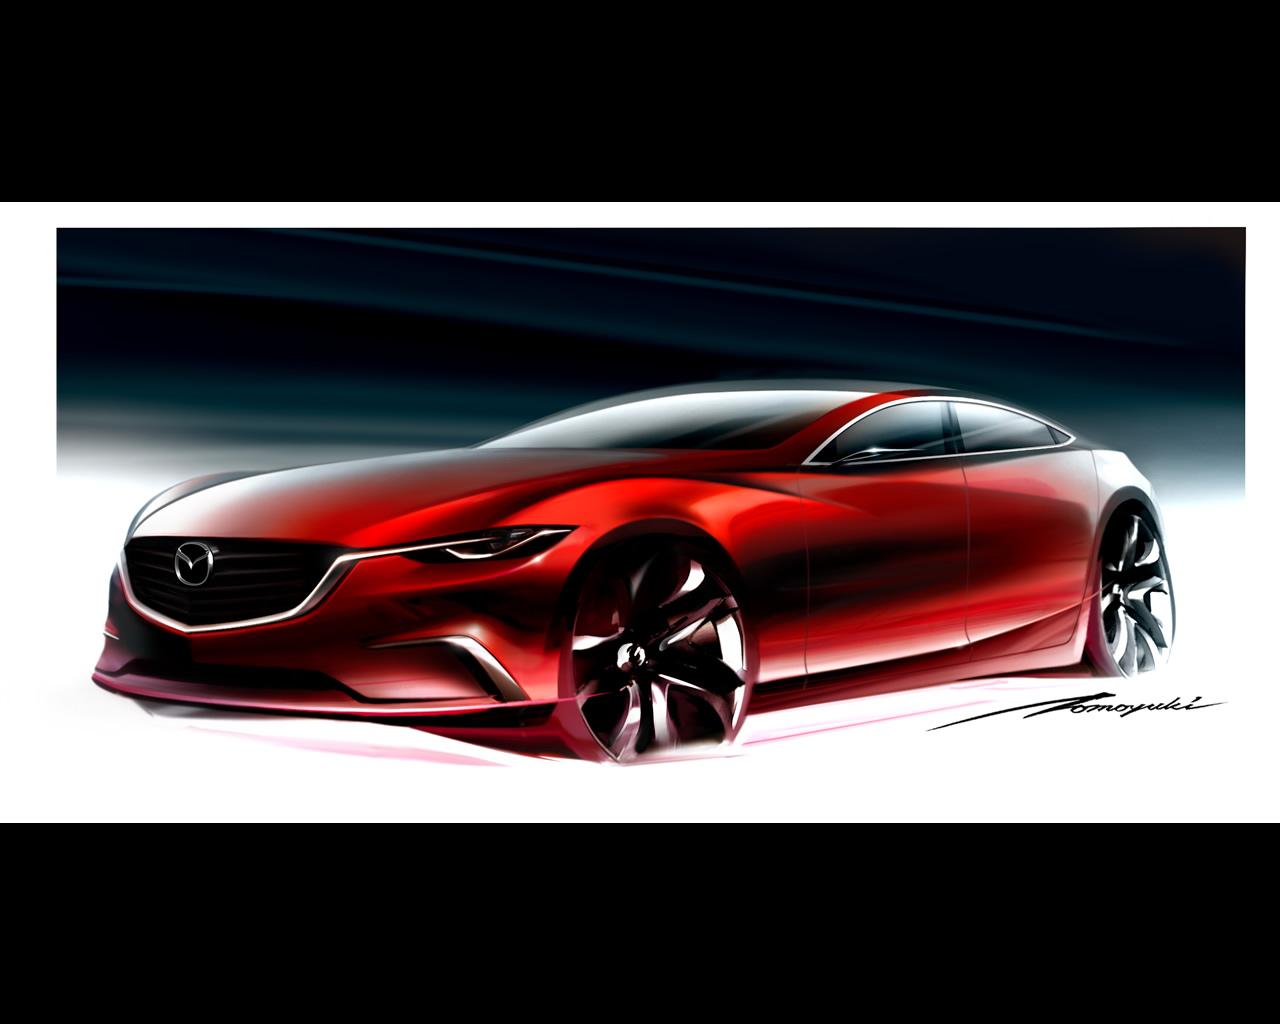 http://www.autoconcept-reviews.com/cars_reviews/mazda/mazda-takeri-sedan-concept-2011/wallpapers/mazda-takeri-sedan-concept-2011-5.jpg